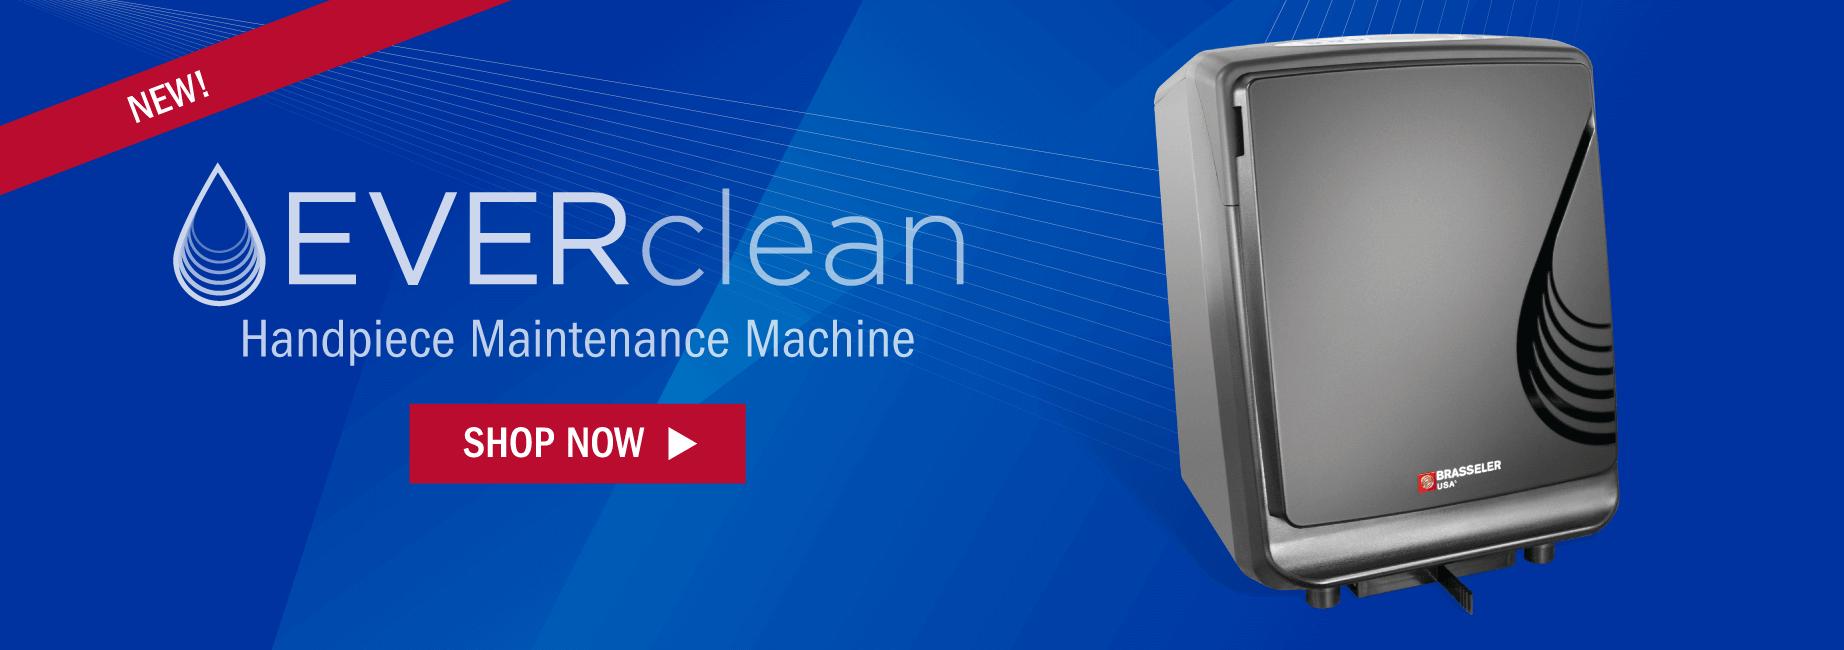 New! EvenClean Maintenance Machine